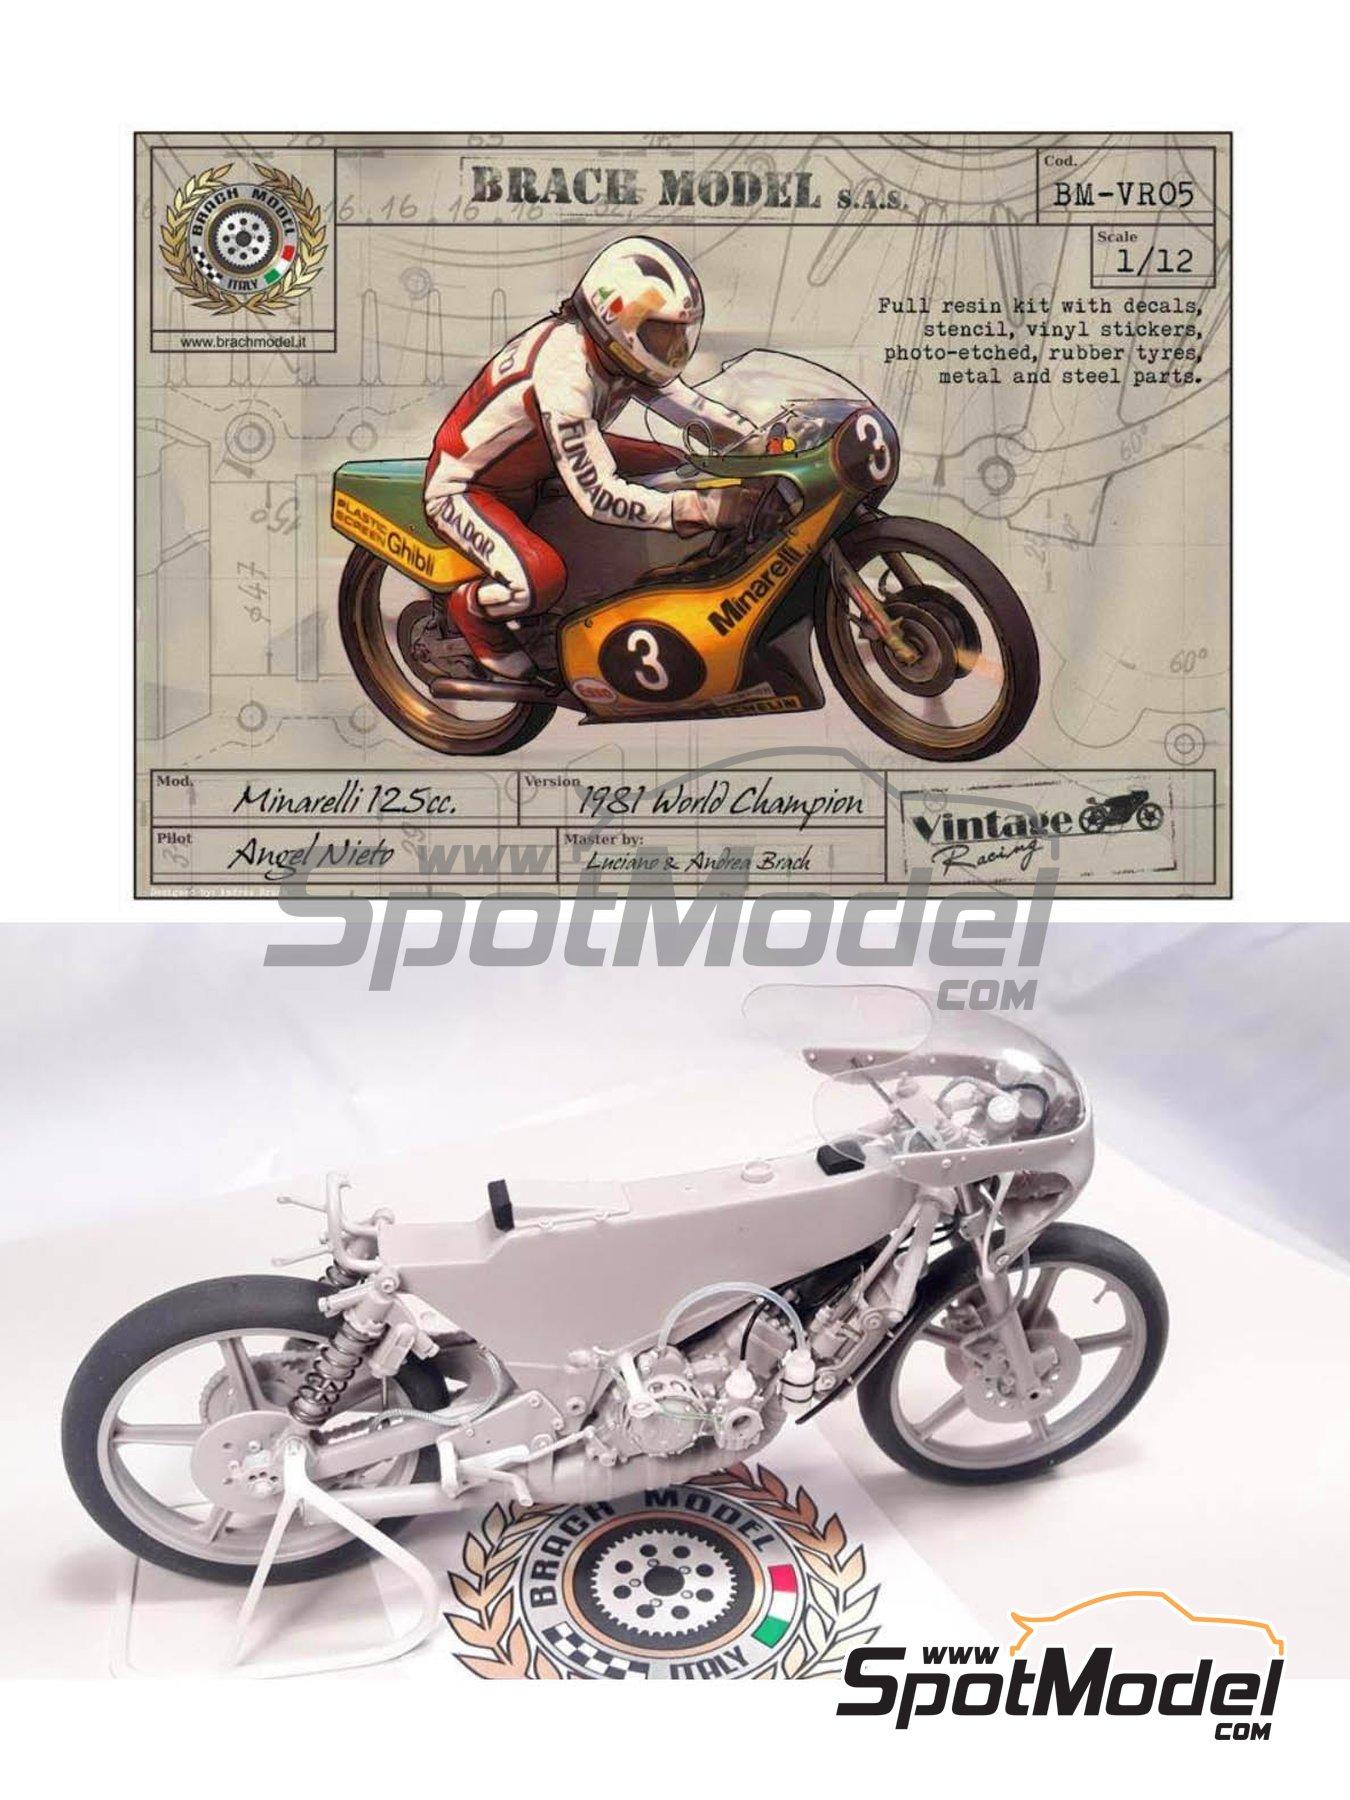 Minarelli 125cc - Motorcycle World Championship 1981 | Model bike kit in 1/12 scale manufactured by Brach Model (ref.BM-VR05) image